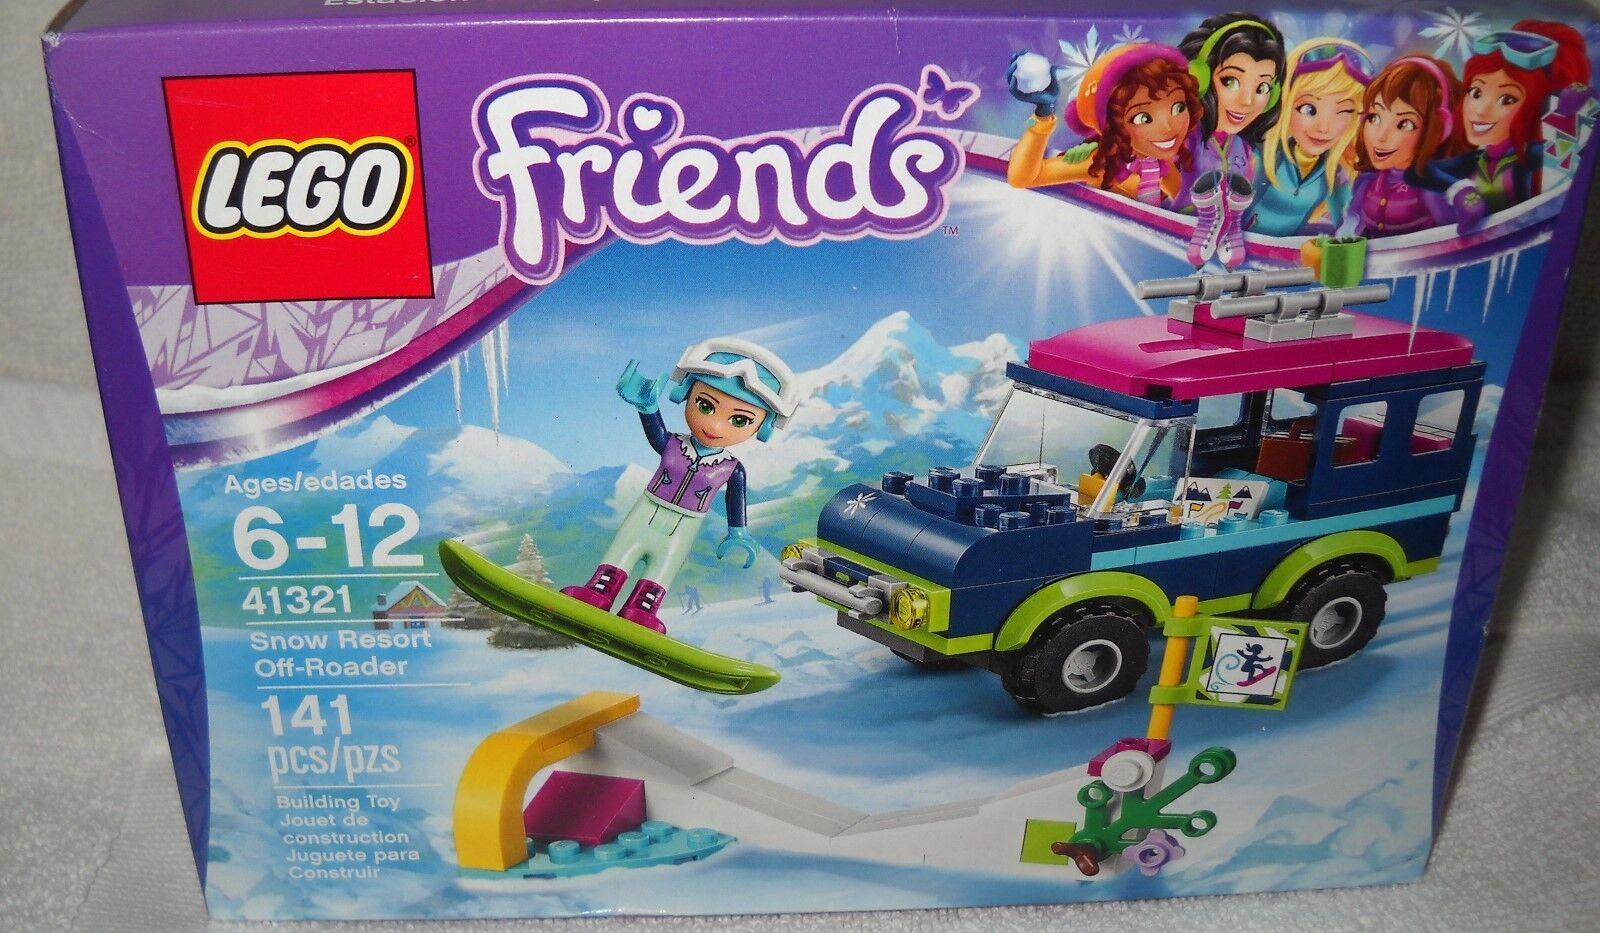 9724 NRFB LEGO Friends Snow Resort Off Roader Model  41321